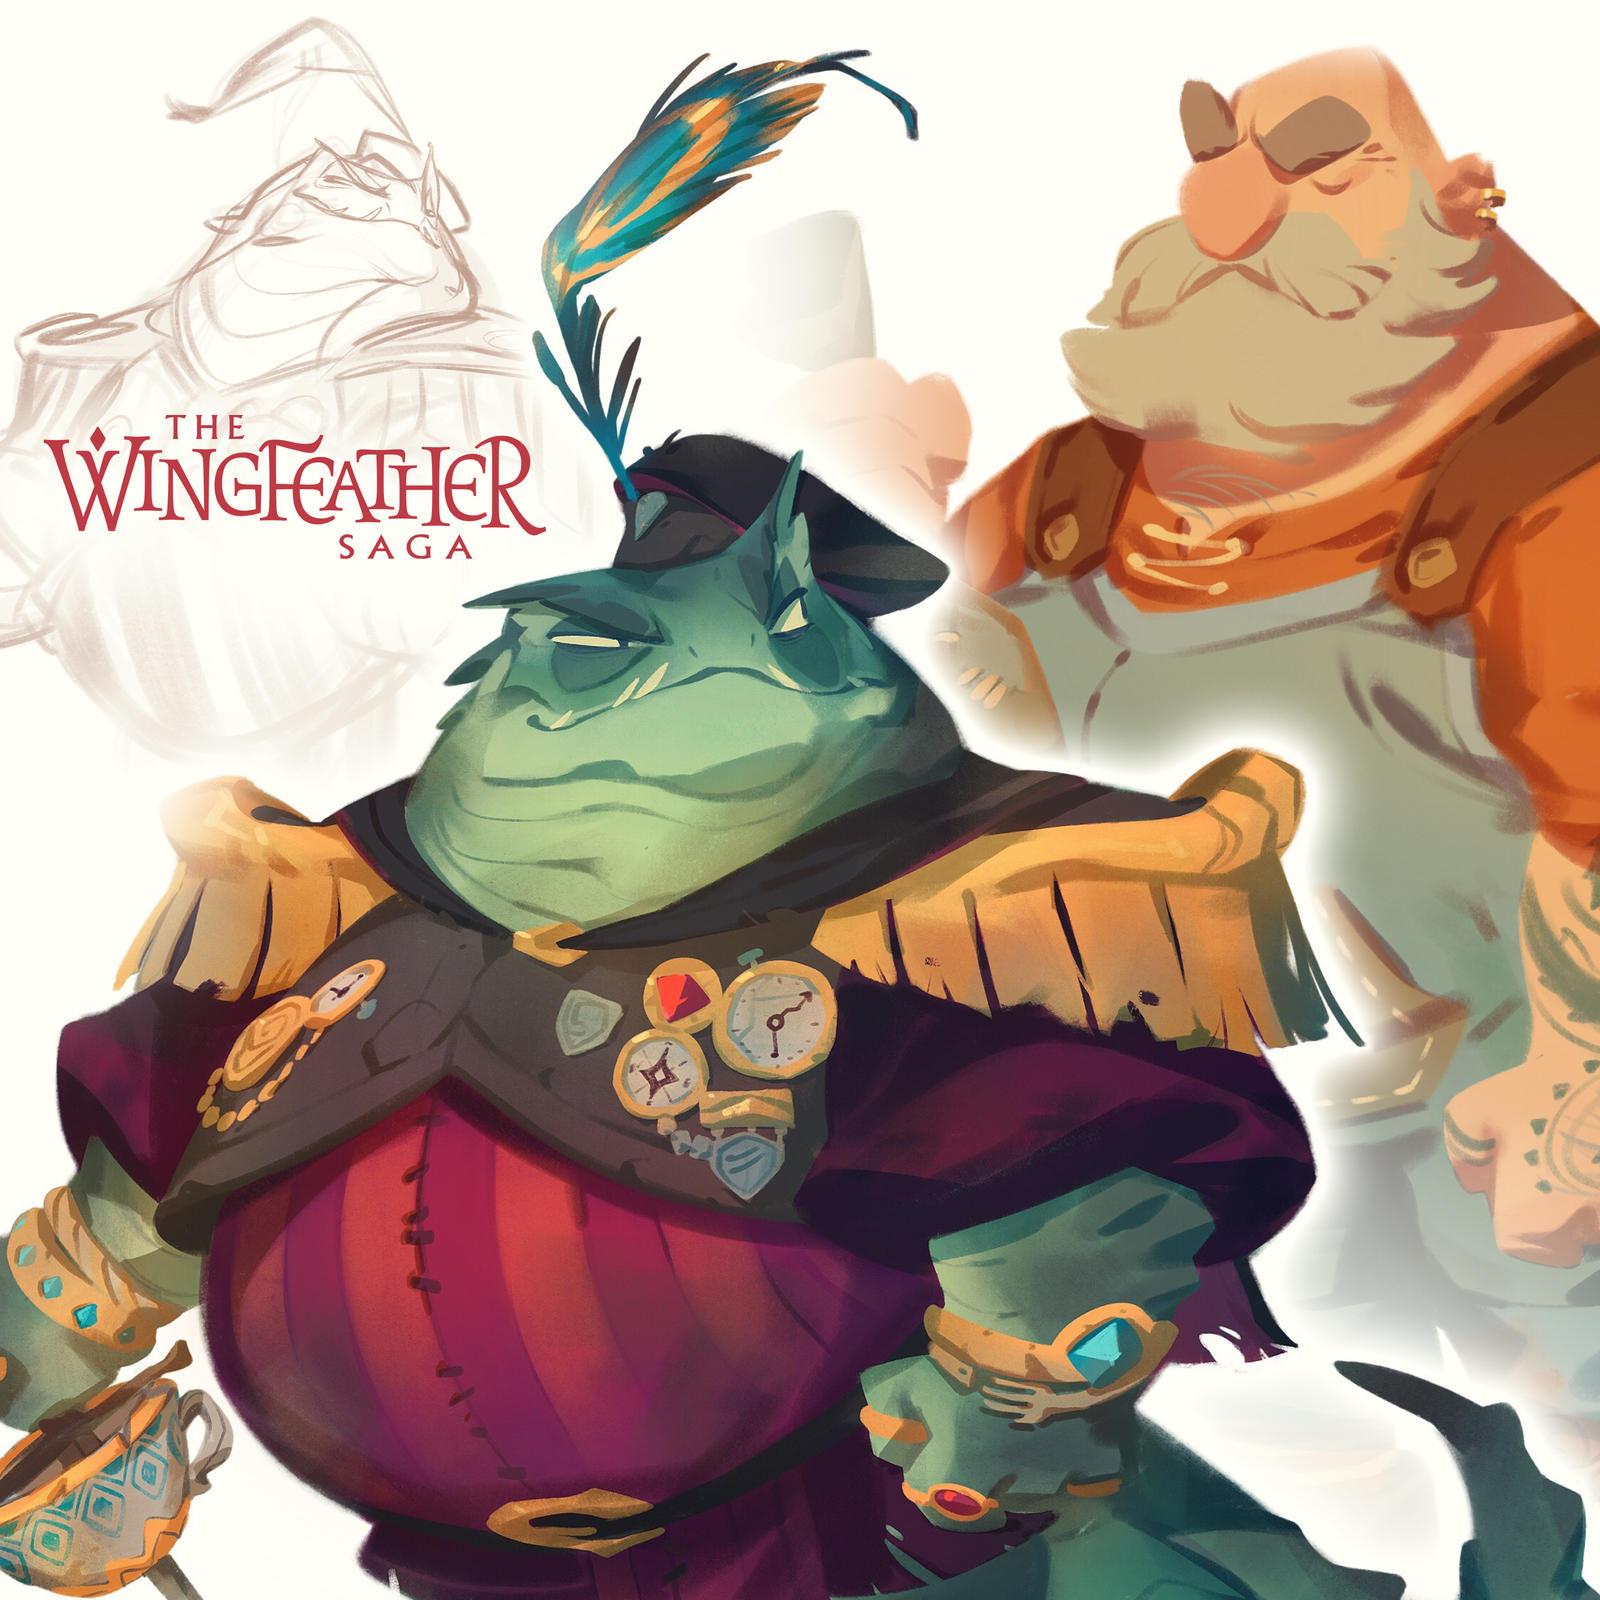 The Wingfeather Saga - Short Film Released by nicholaskole